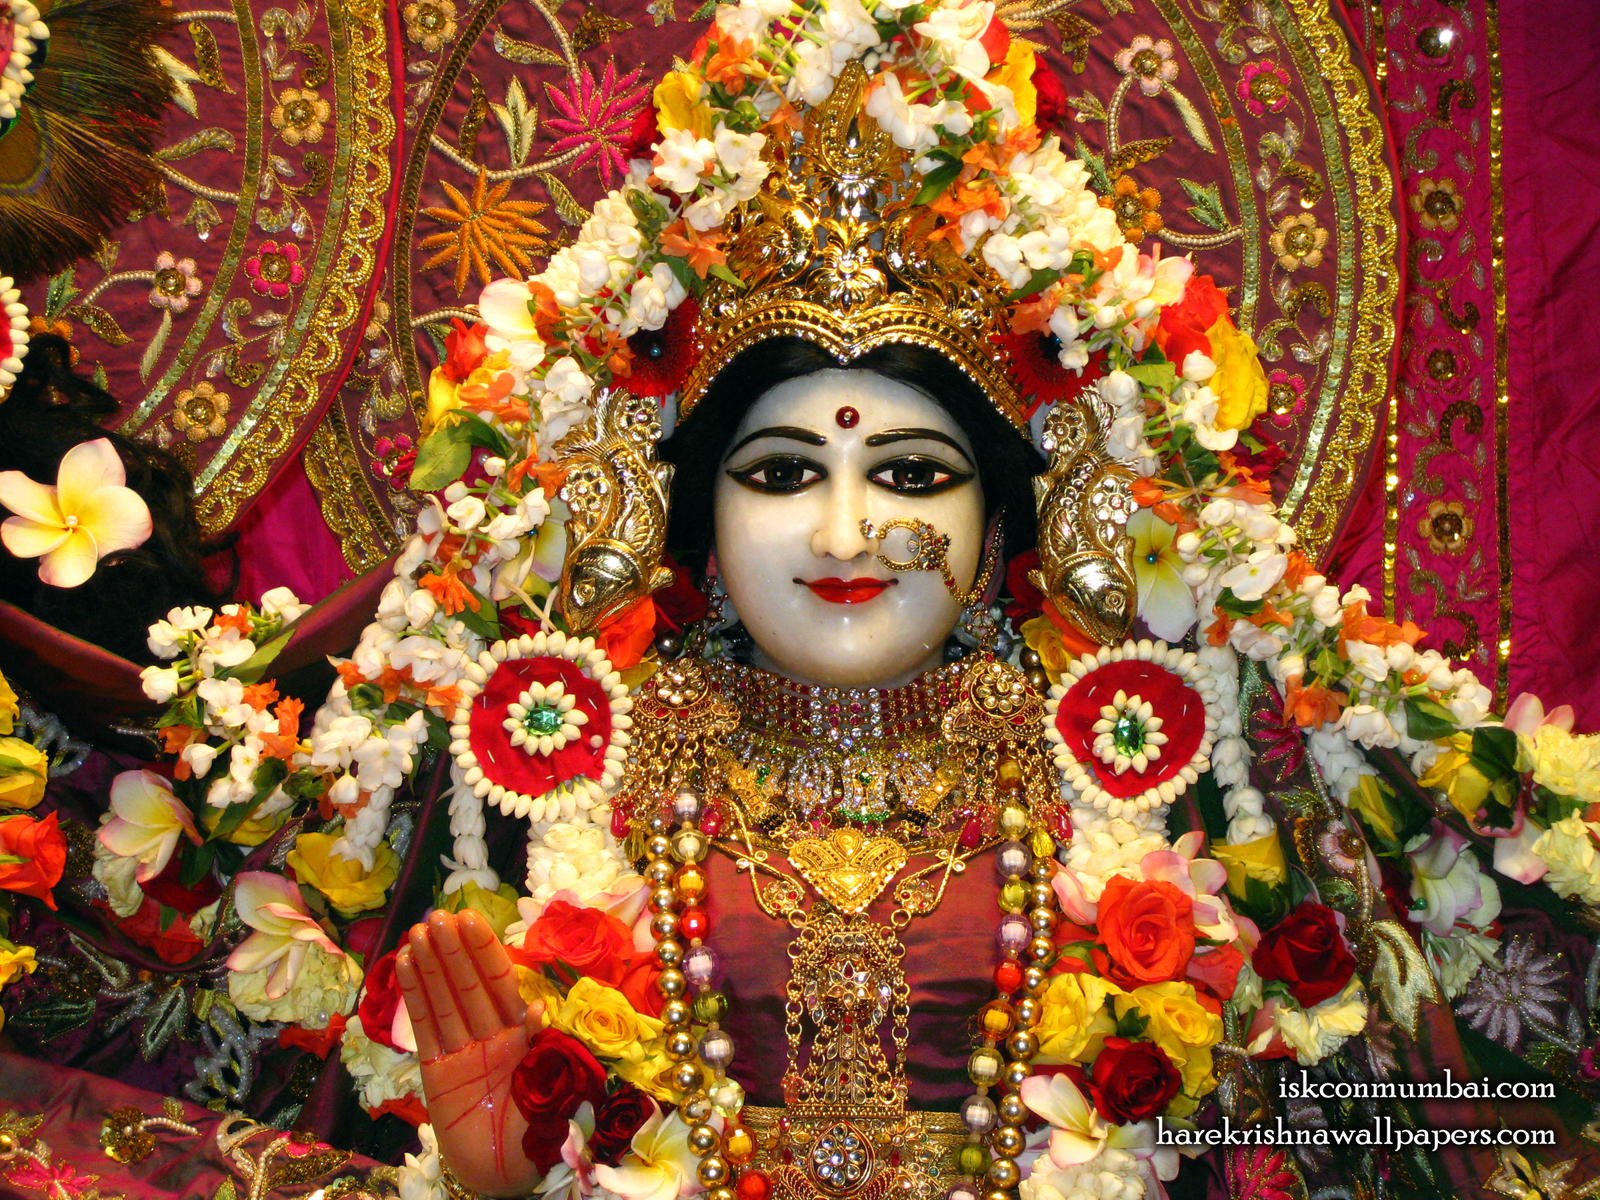 Sri Radha Face Wallpaper (009) Size1600x1200 Download